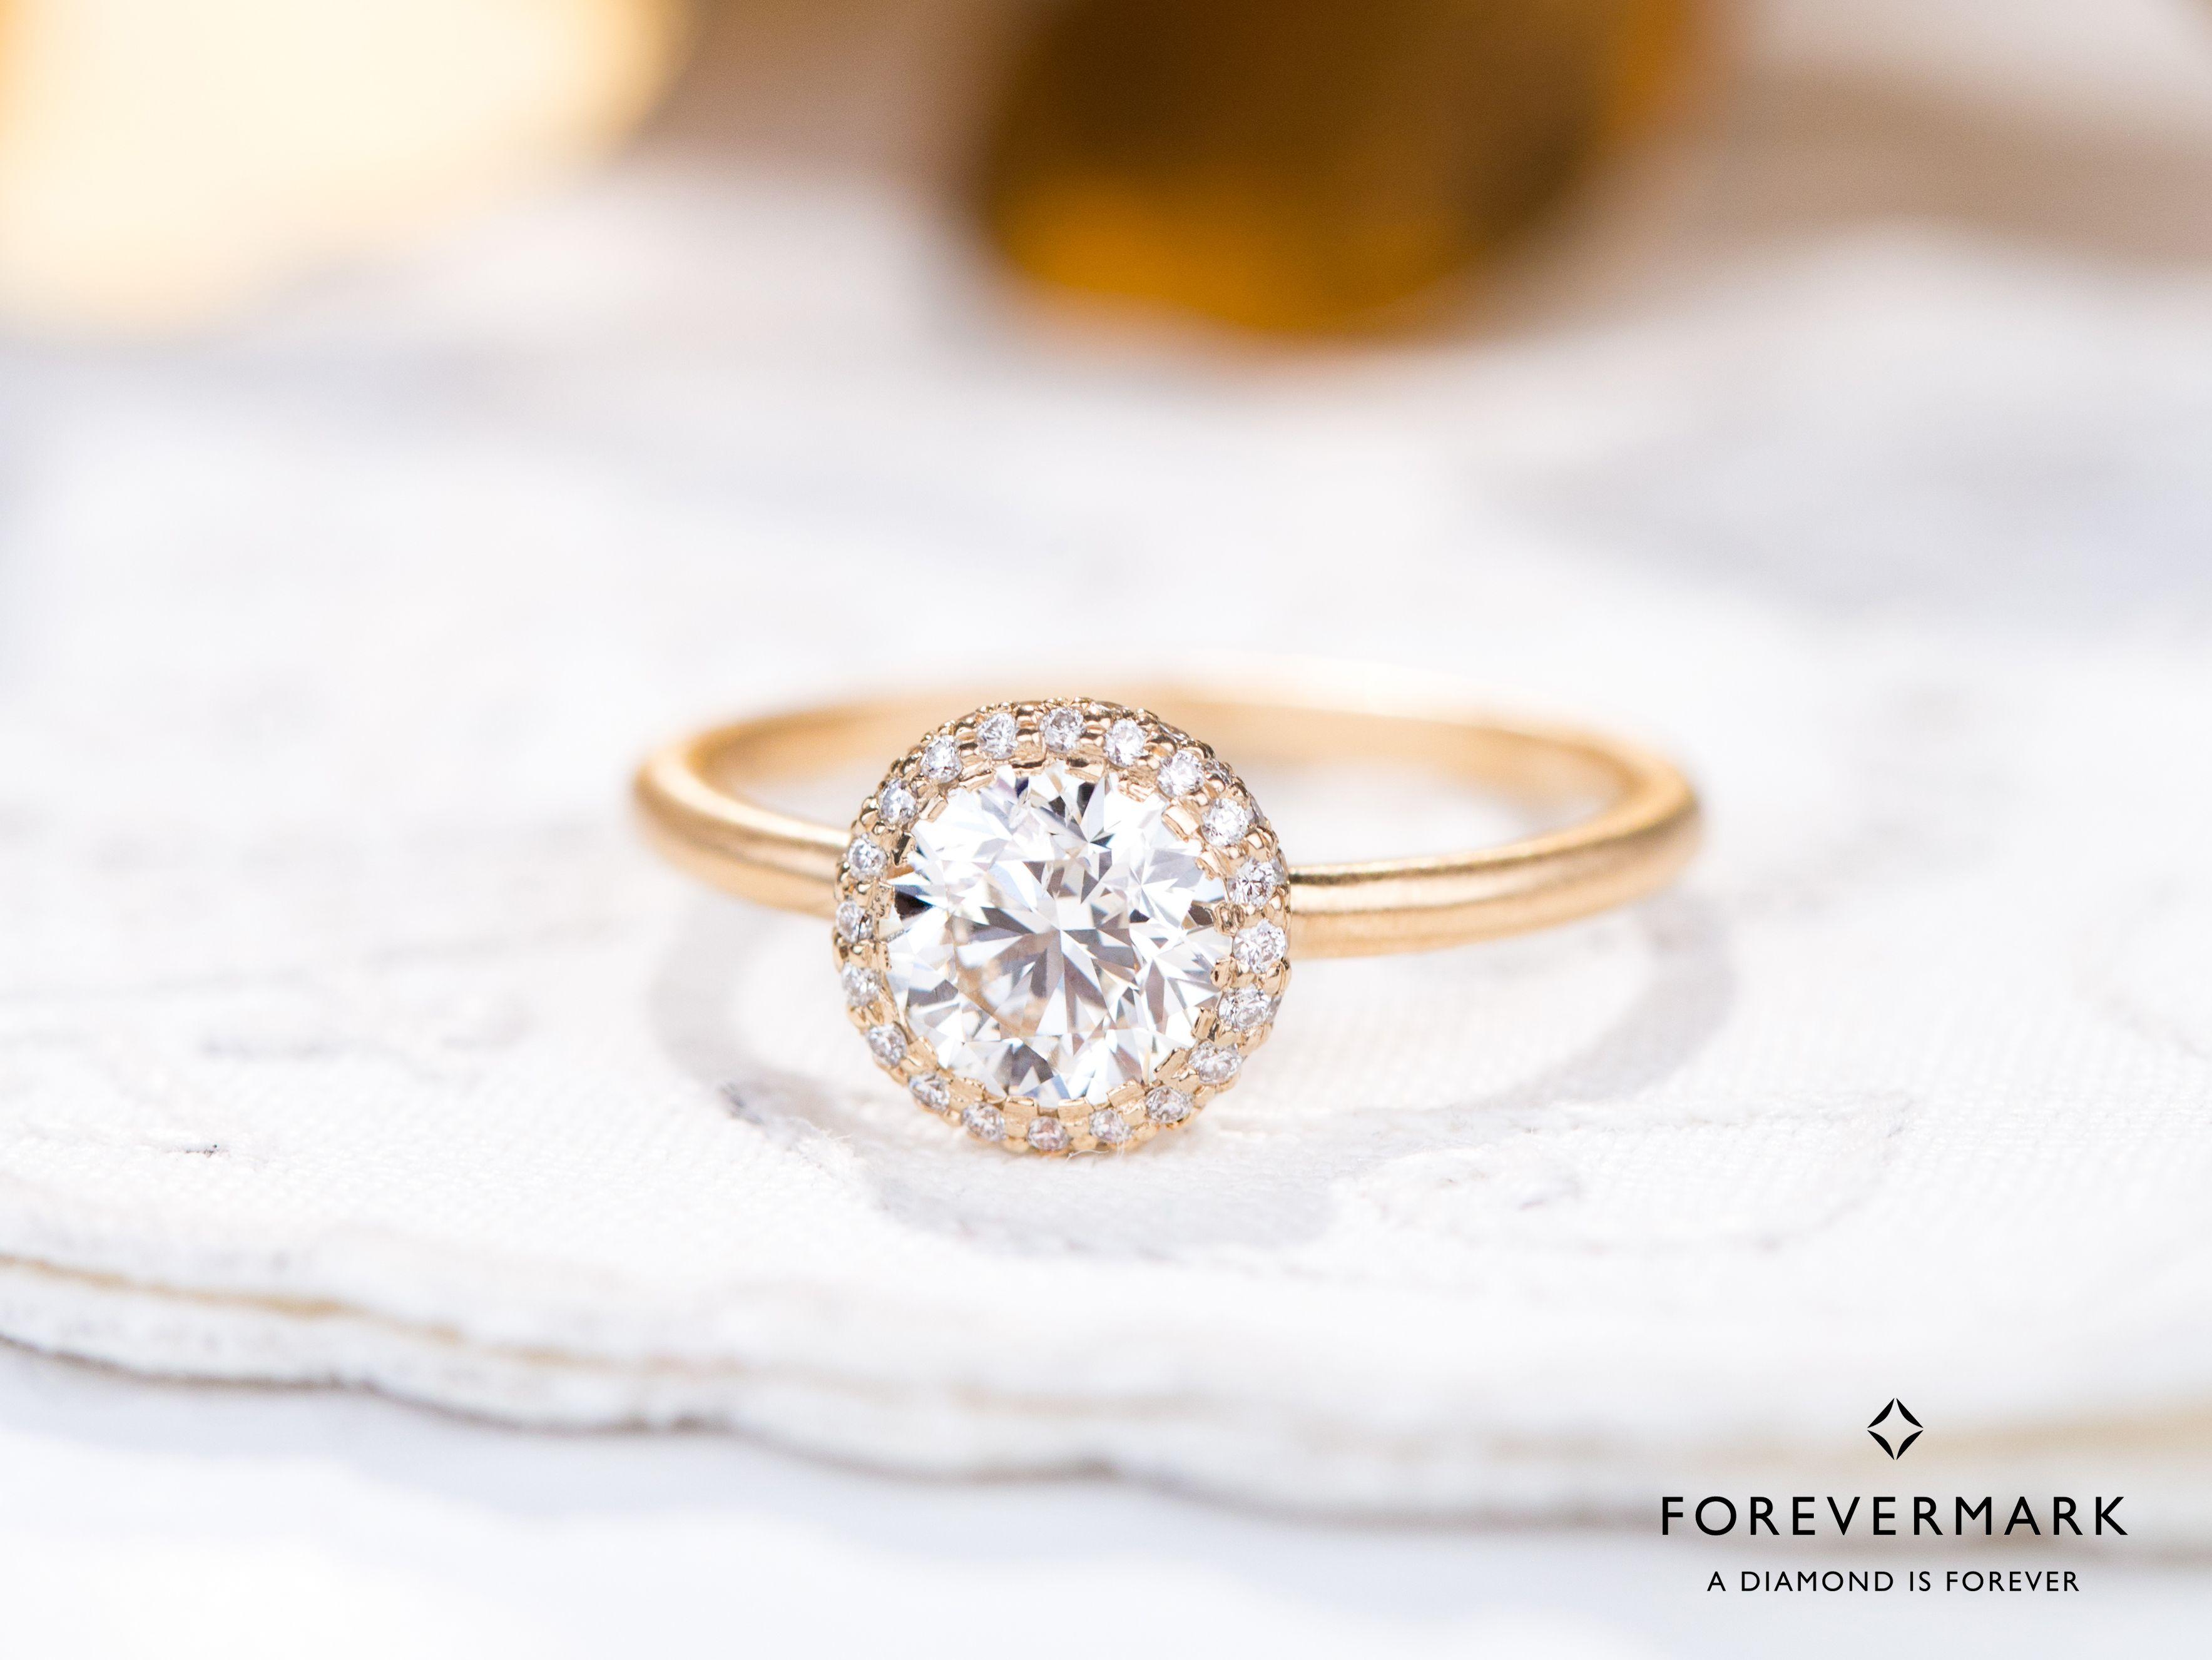 Forevermark Diamond Yellow Gold Engagement Ring In 2020 Forevermark Engagement Ring Yellow Gold Diamond Engagement Ring Yellow Gold Engagement Rings